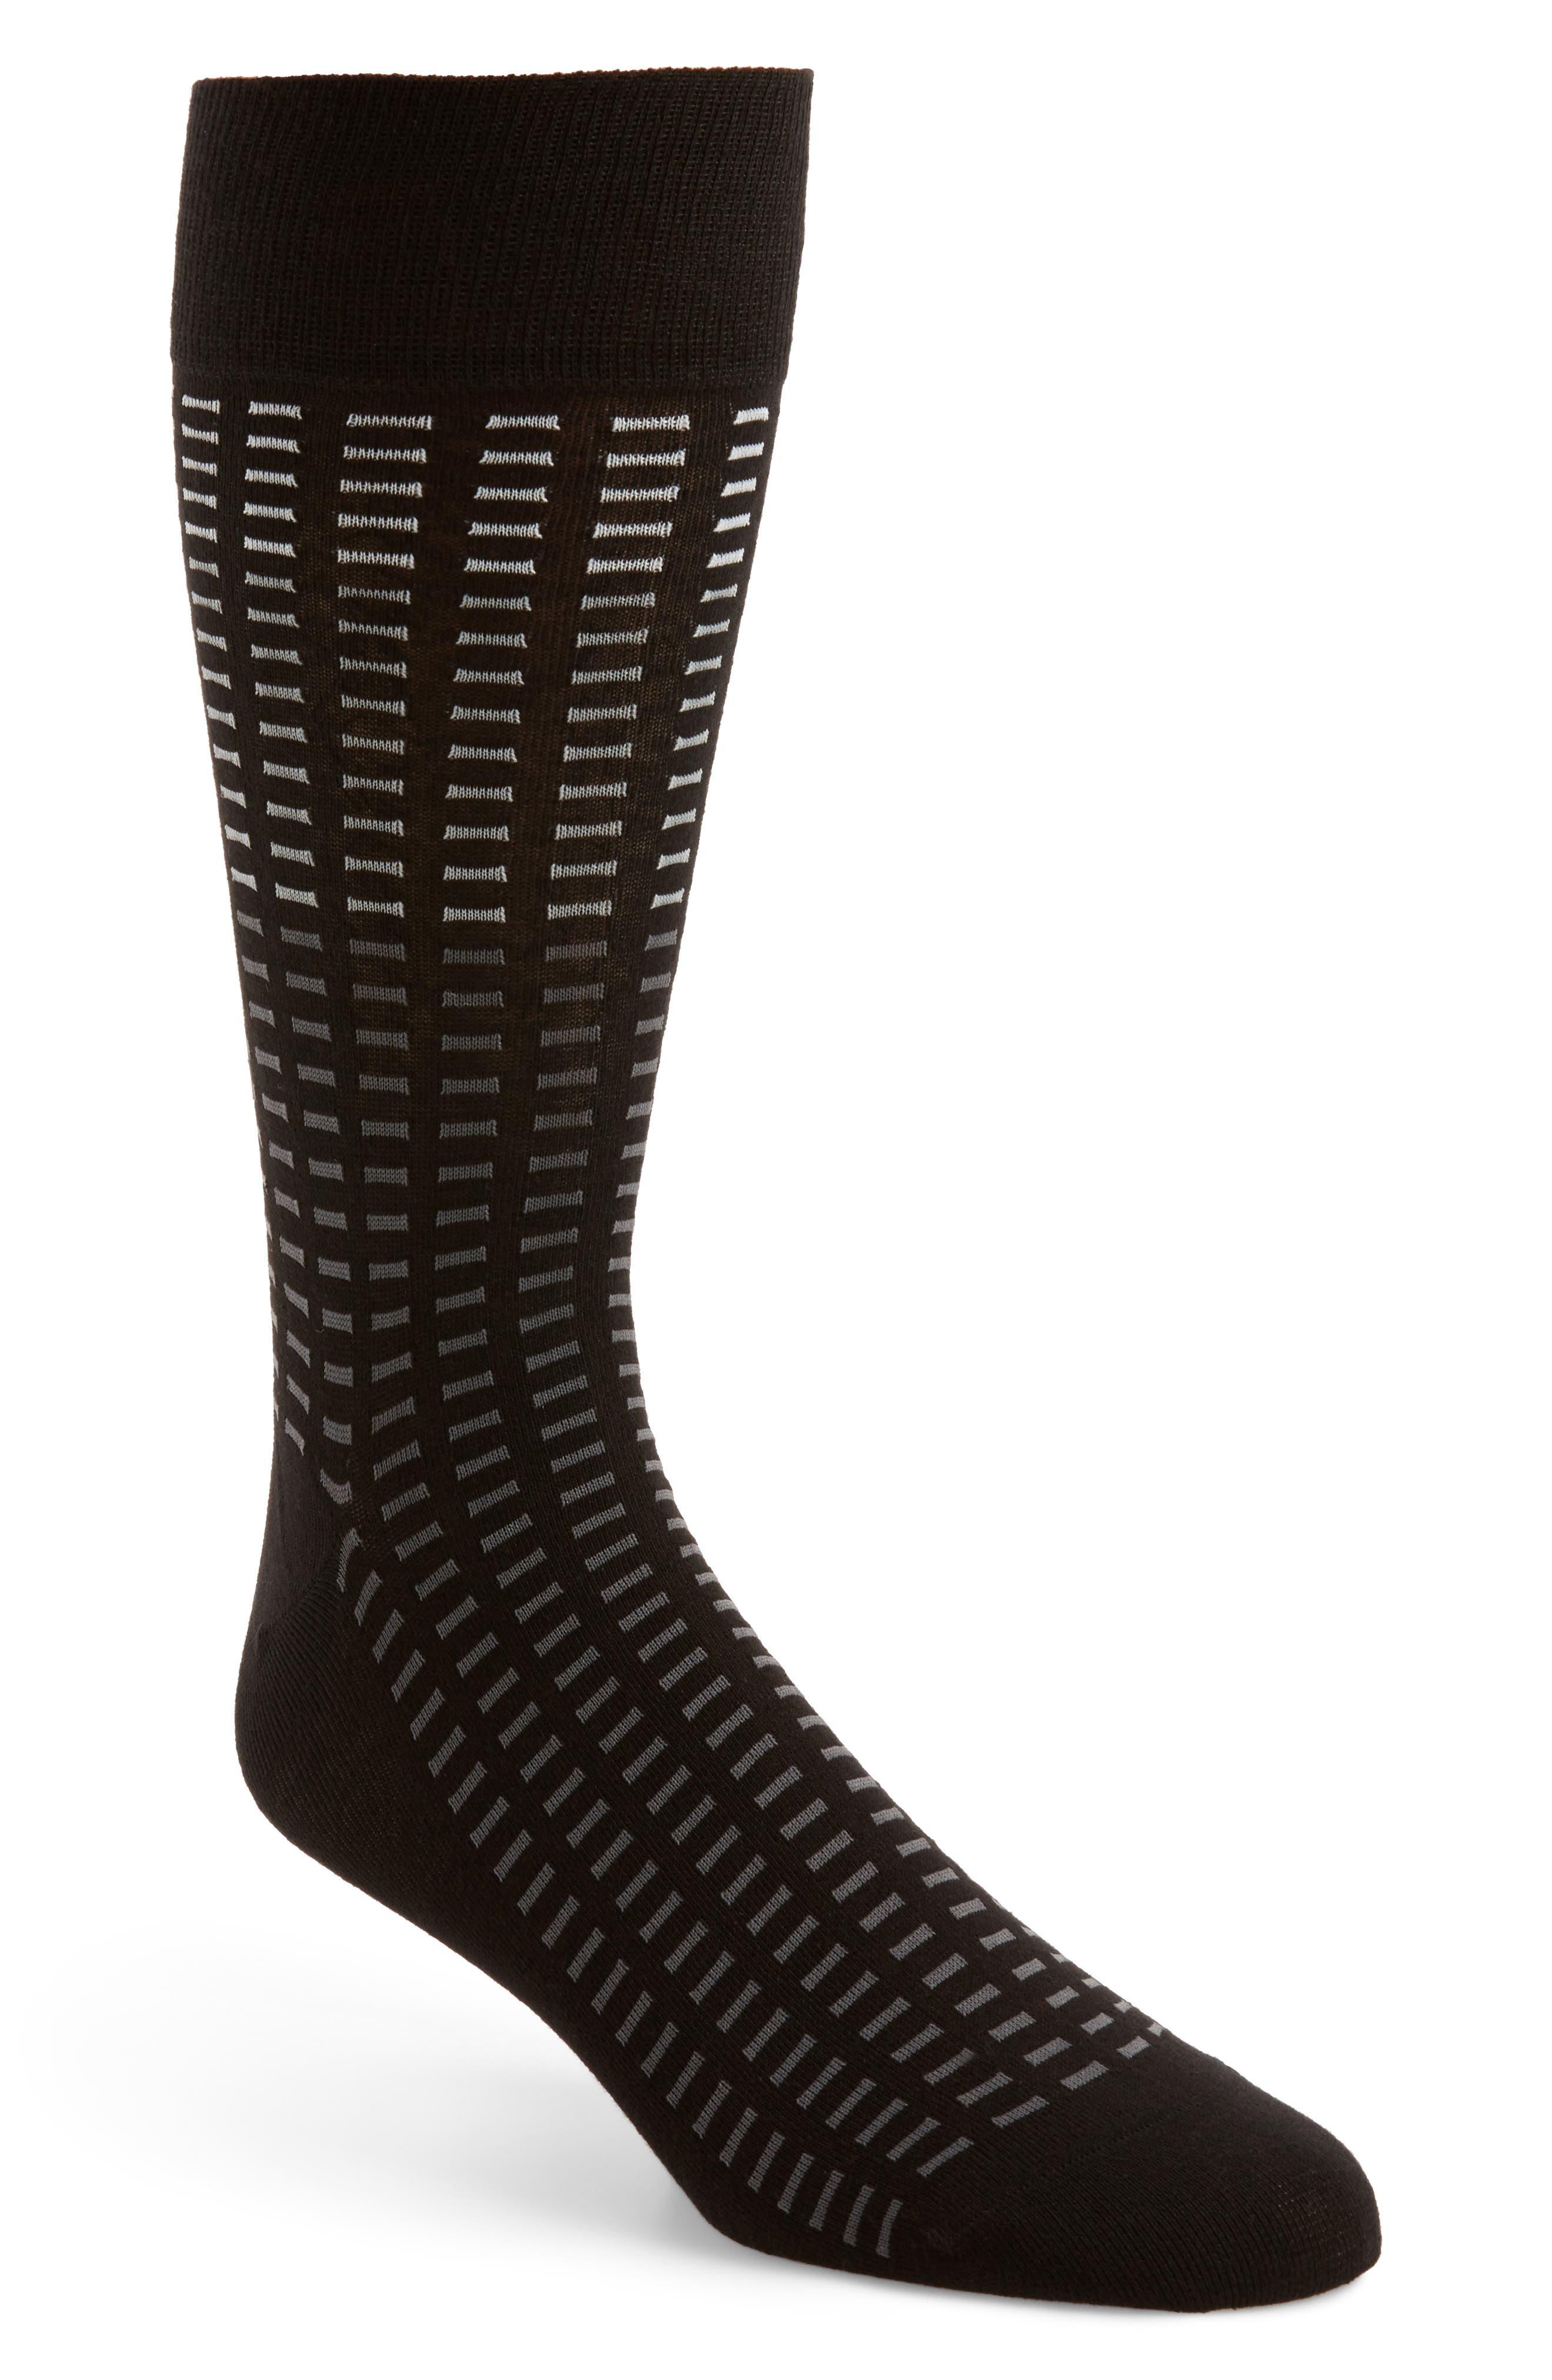 Tile Socks,                         Main,                         color, 001